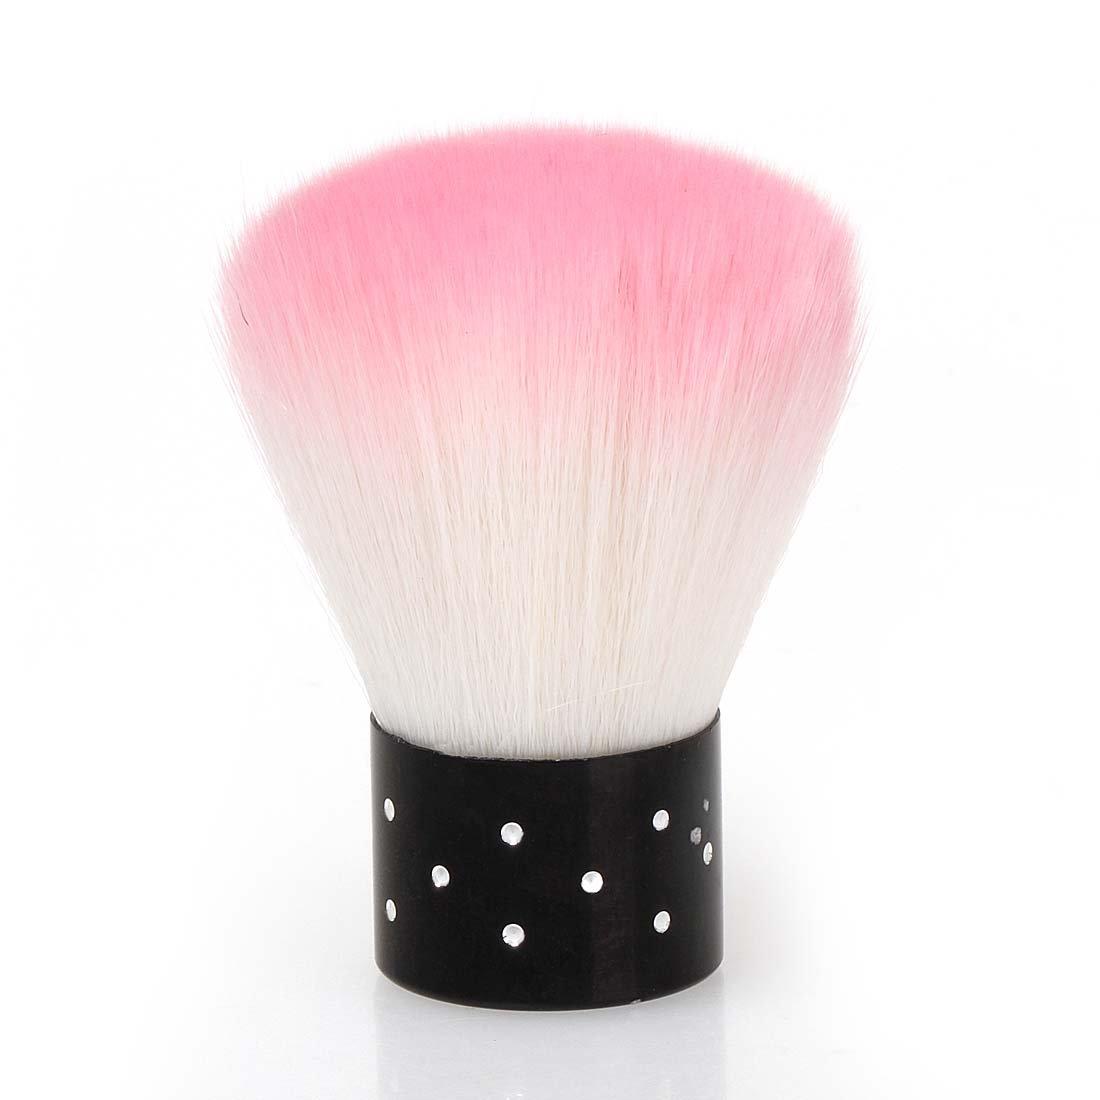 Amazon.com : BMC Pink Colored Synthetic Fiber Acrylic Manicure ...